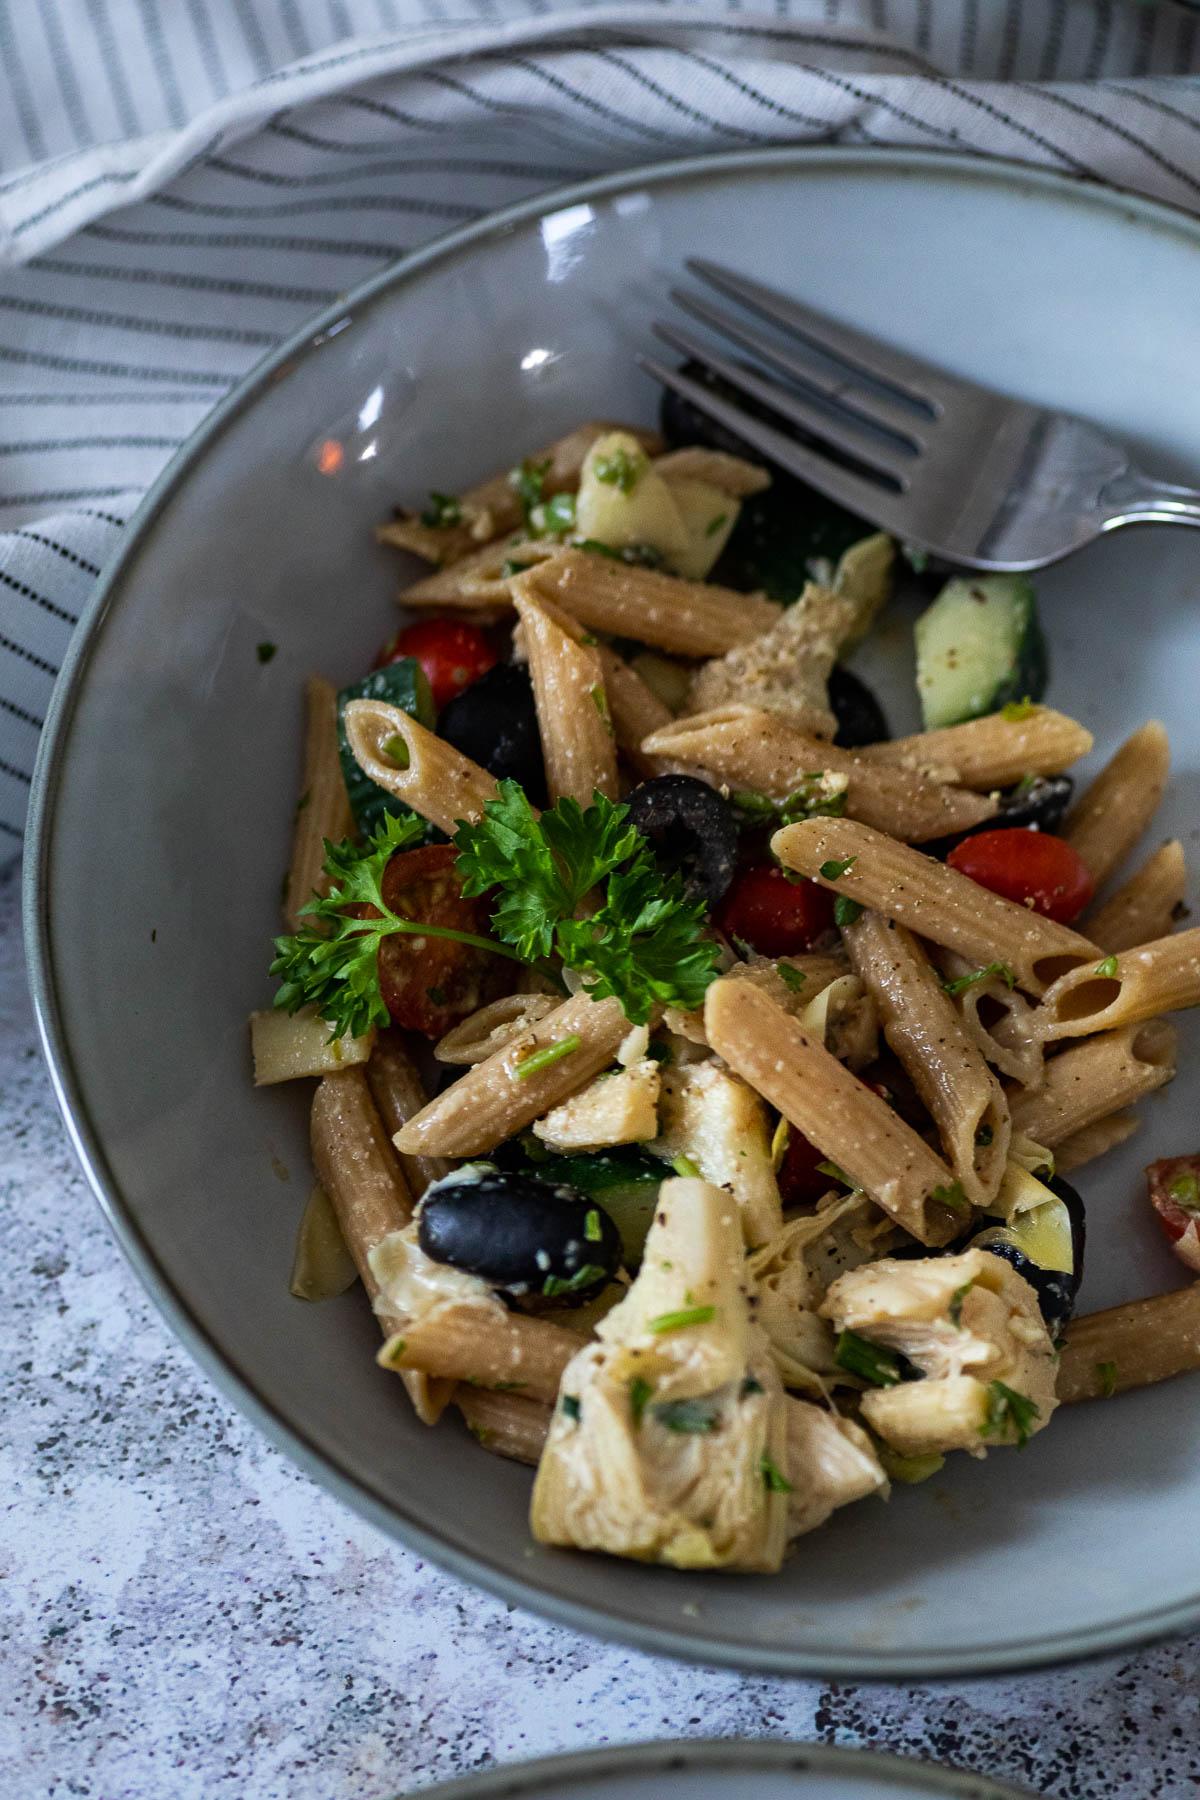 A plate with vegan artichoke pasta salad